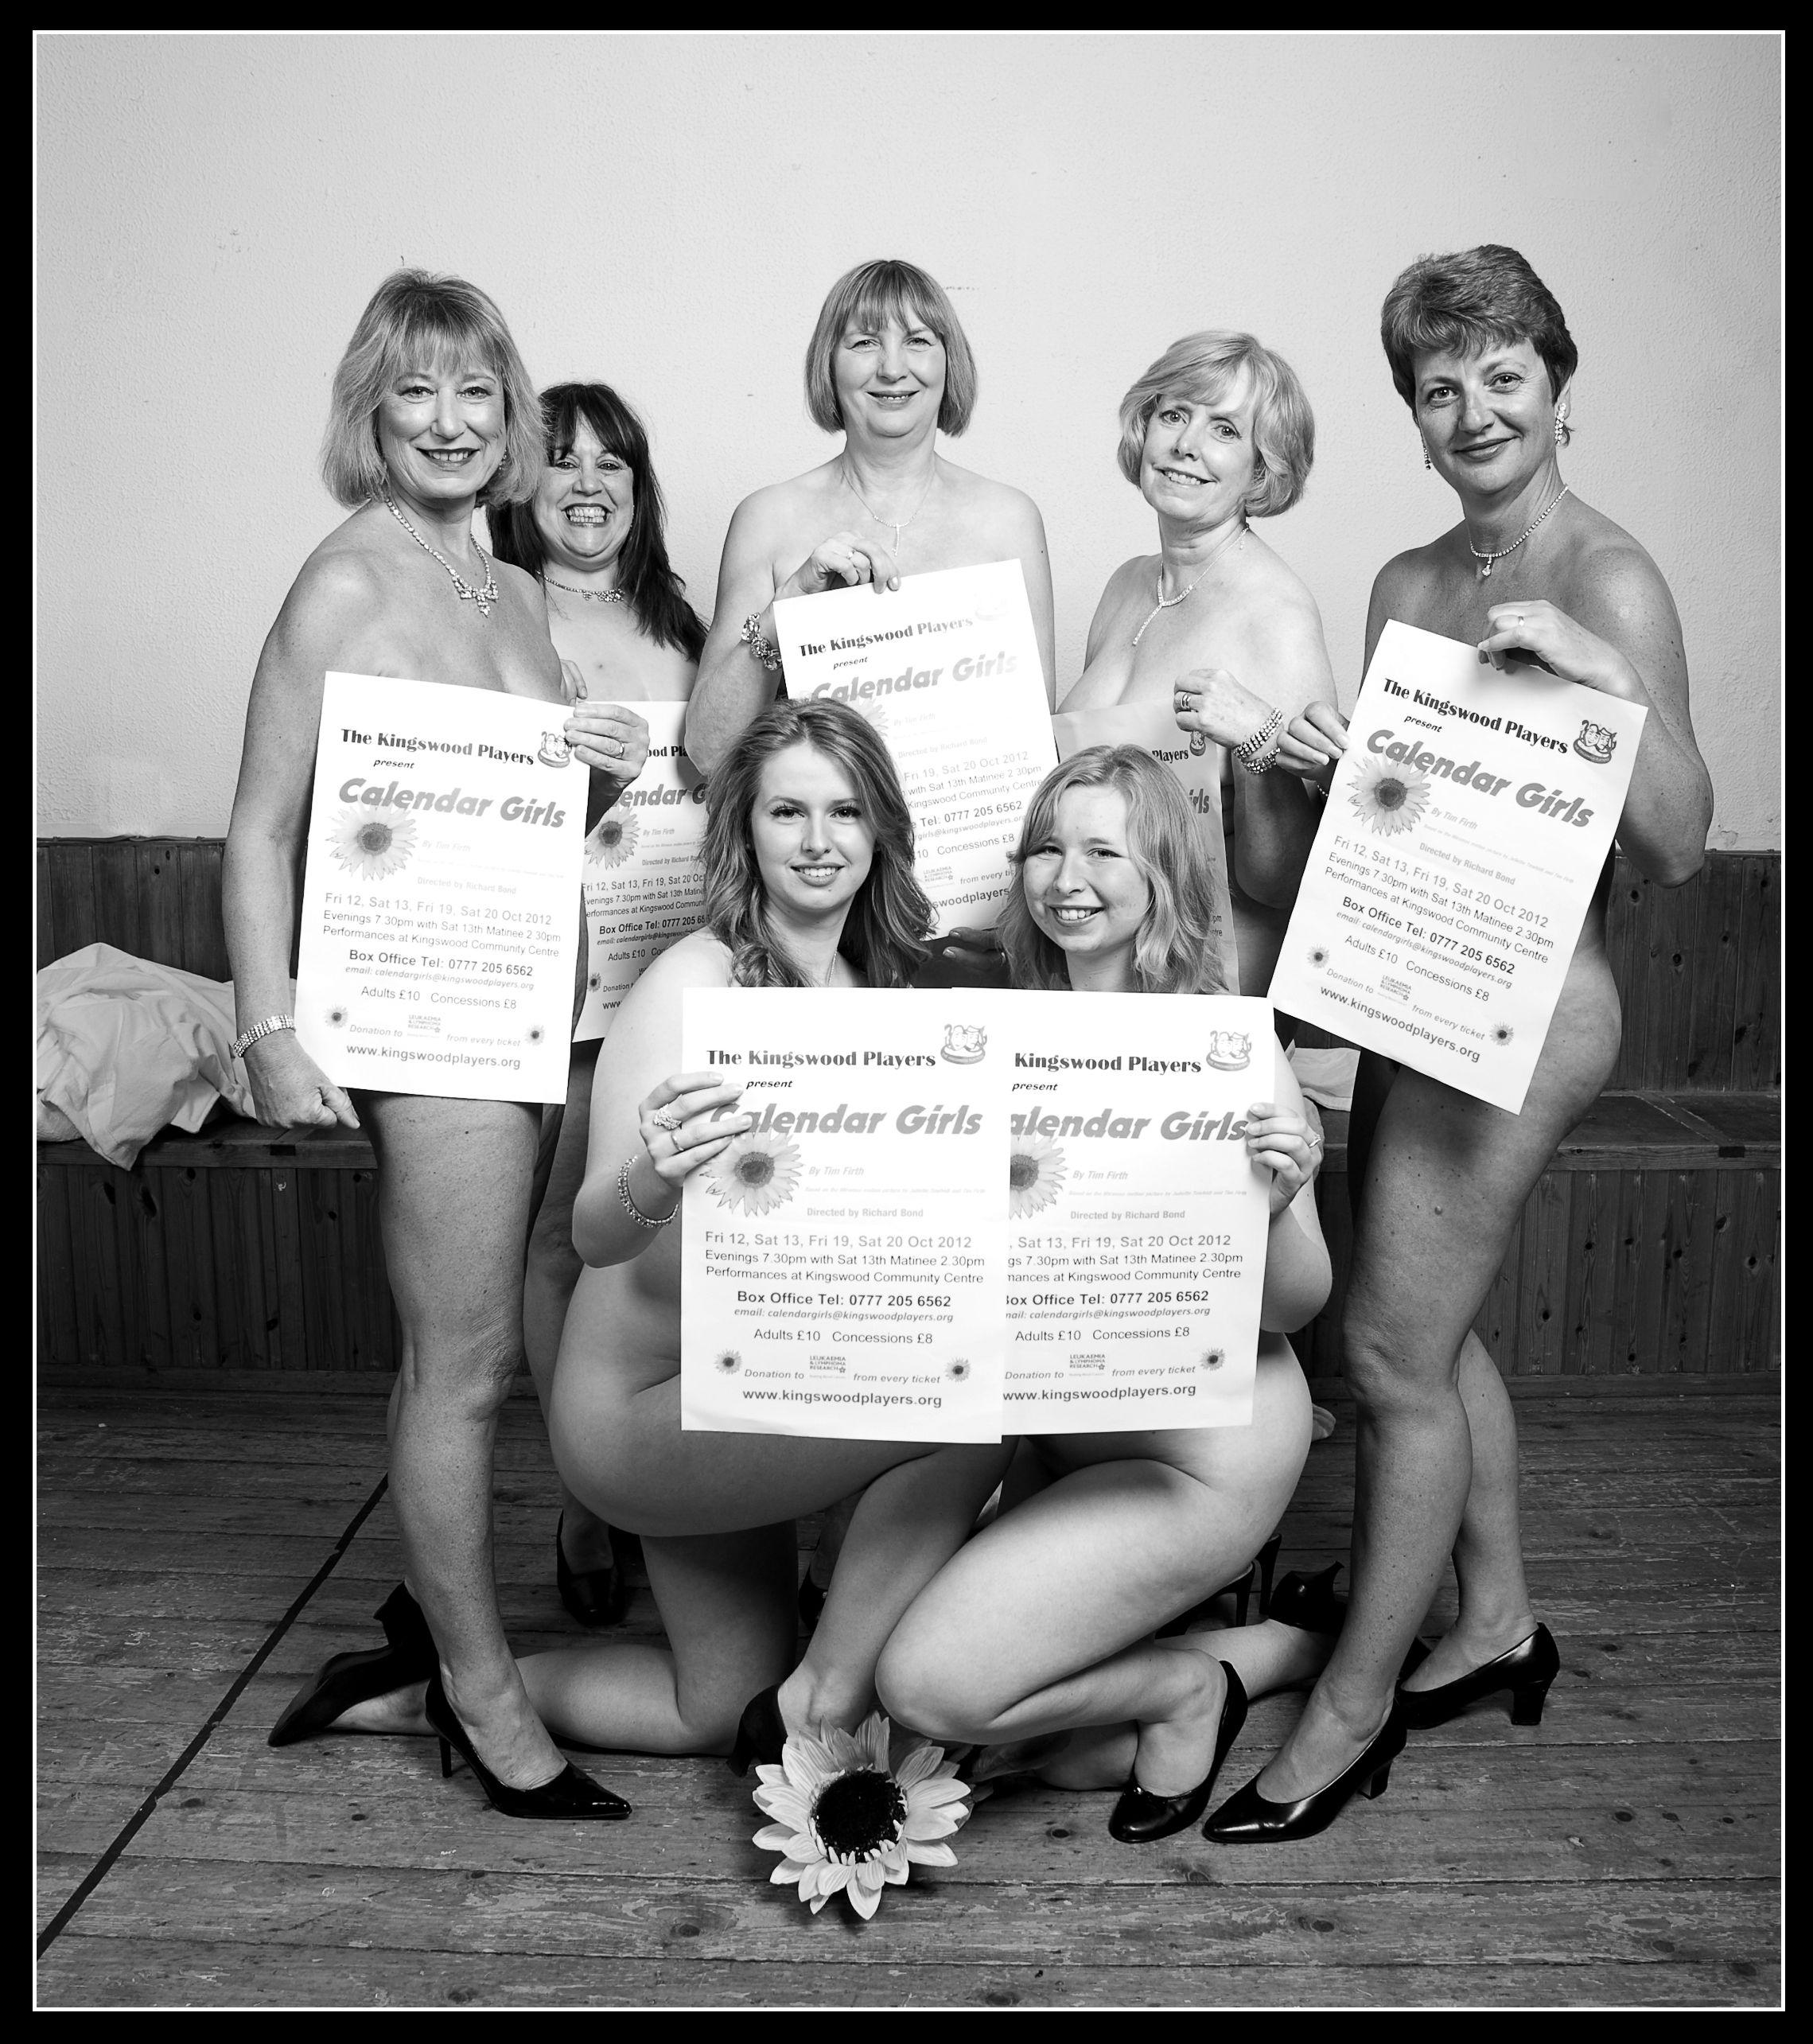 Calendar Girls bare it all - Birdsong Connections